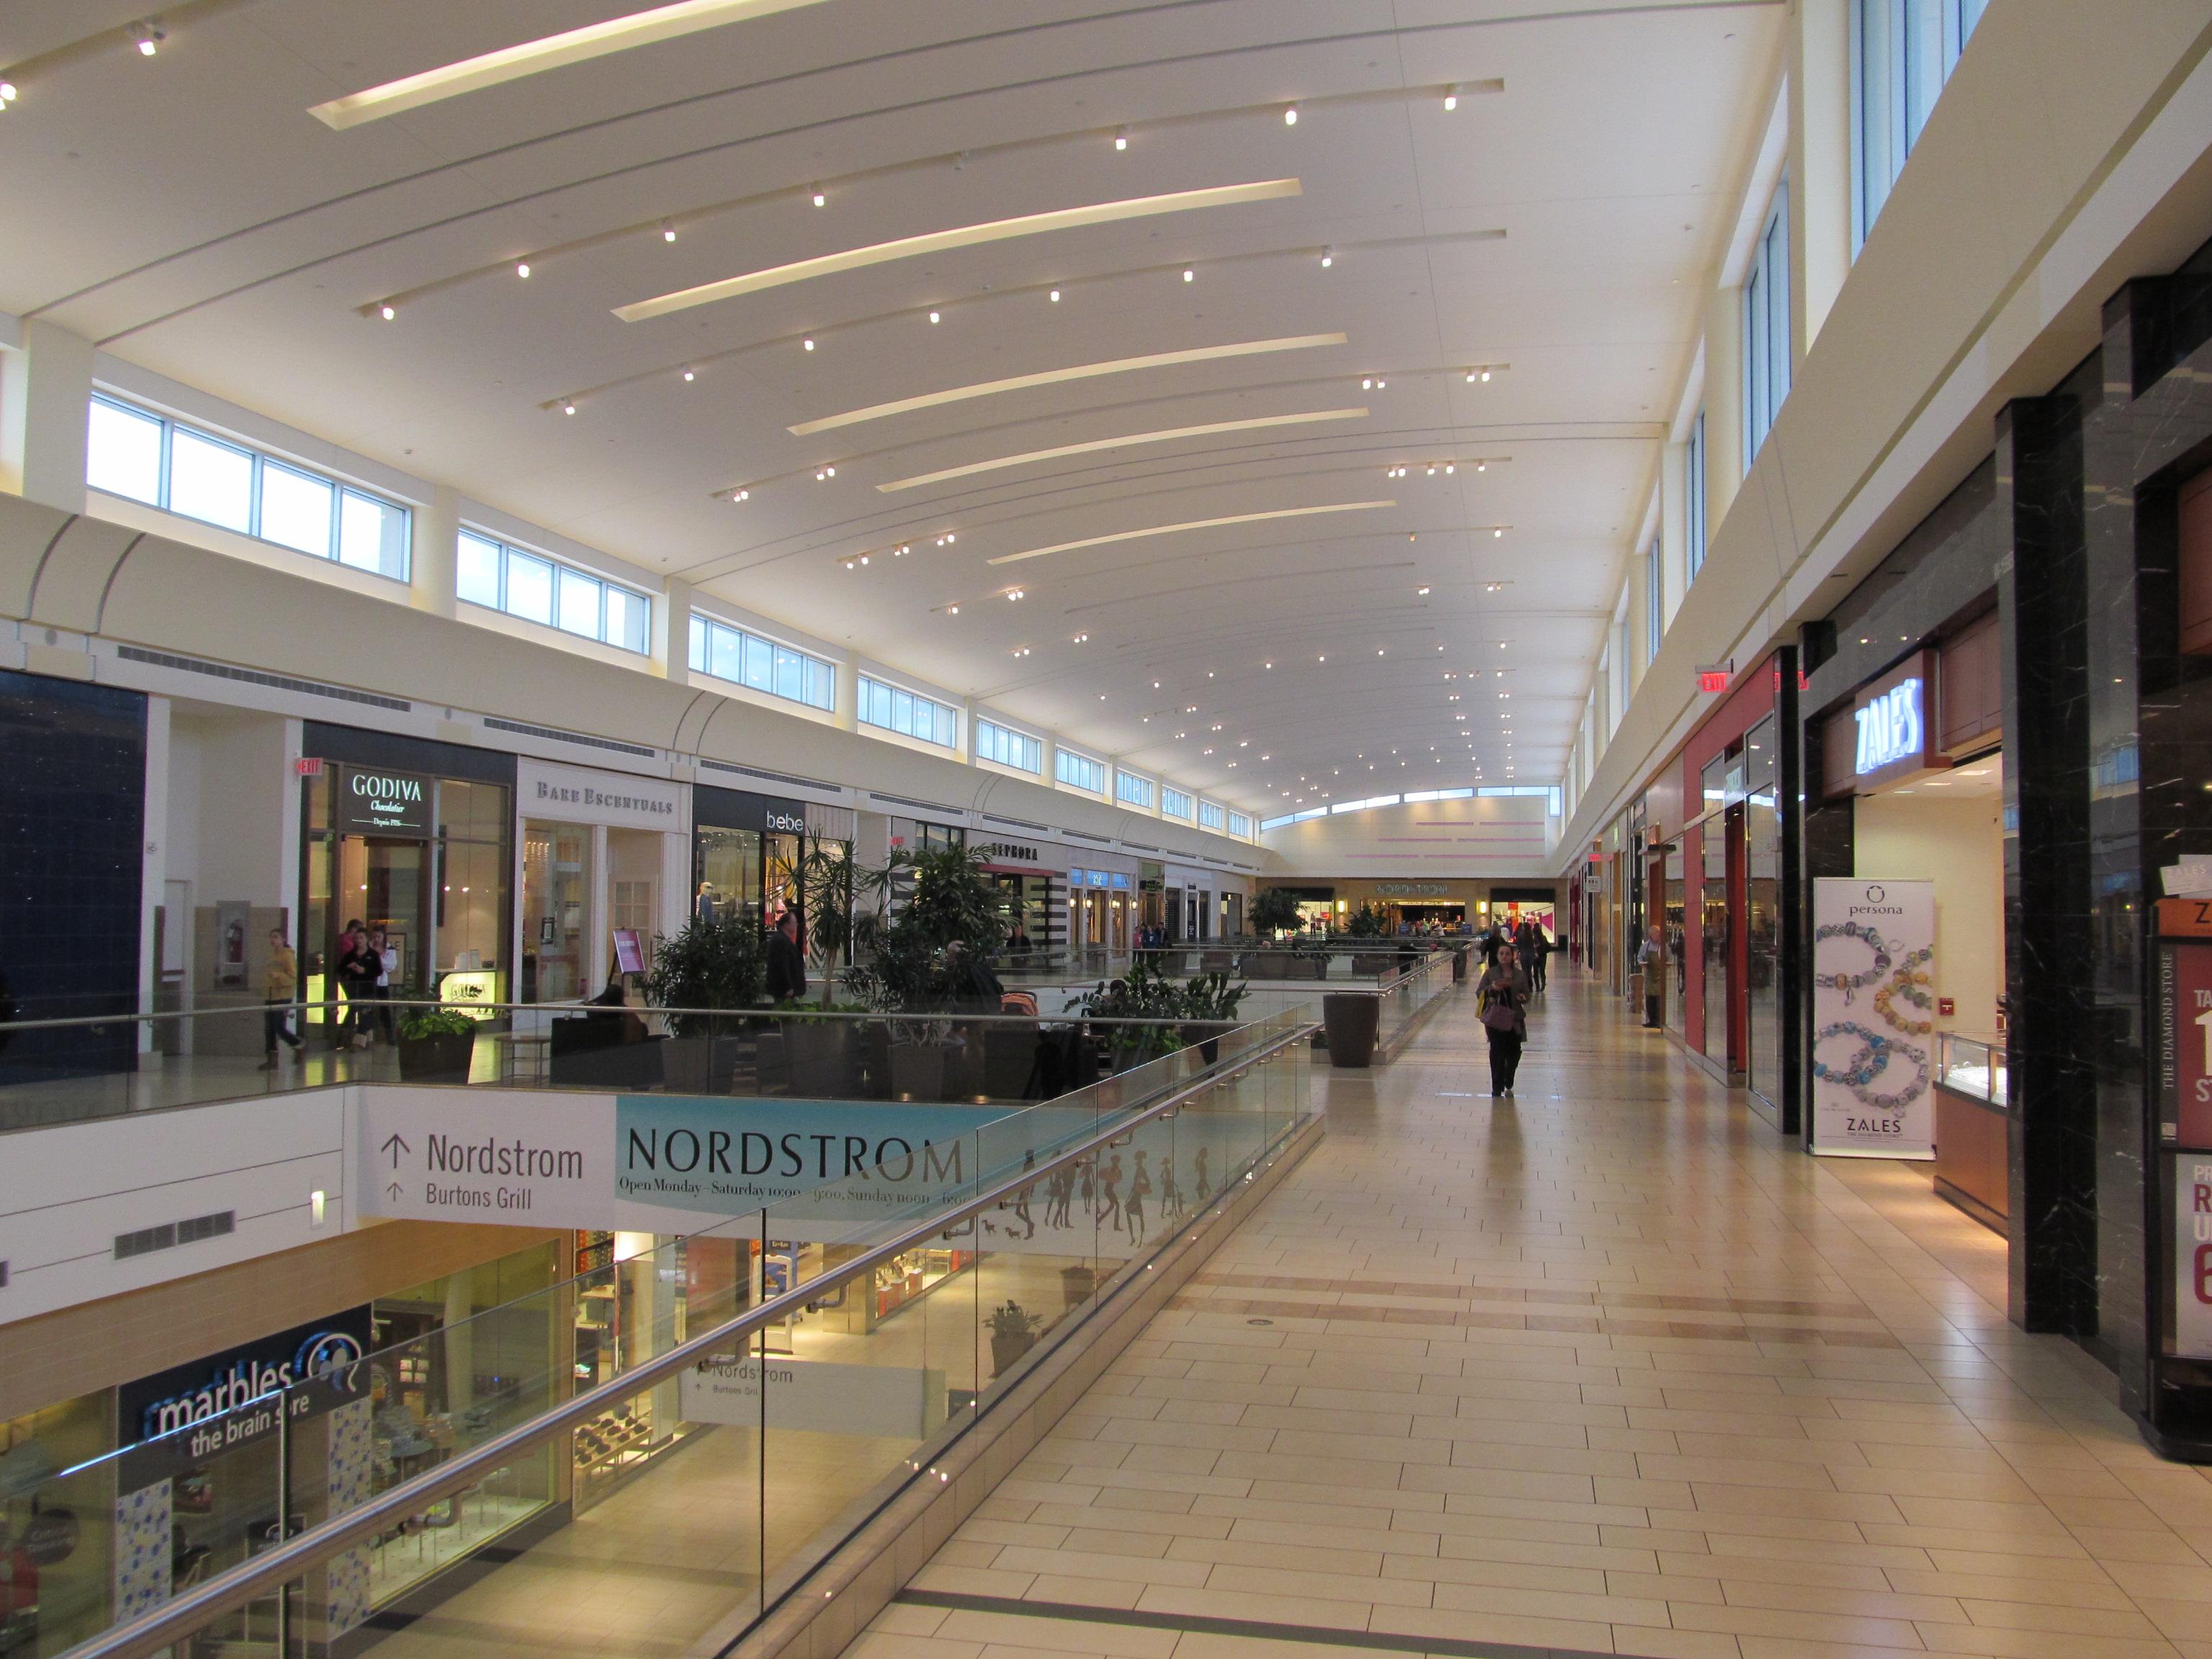 FileInside The Northshore Mall Peabody MAjpg